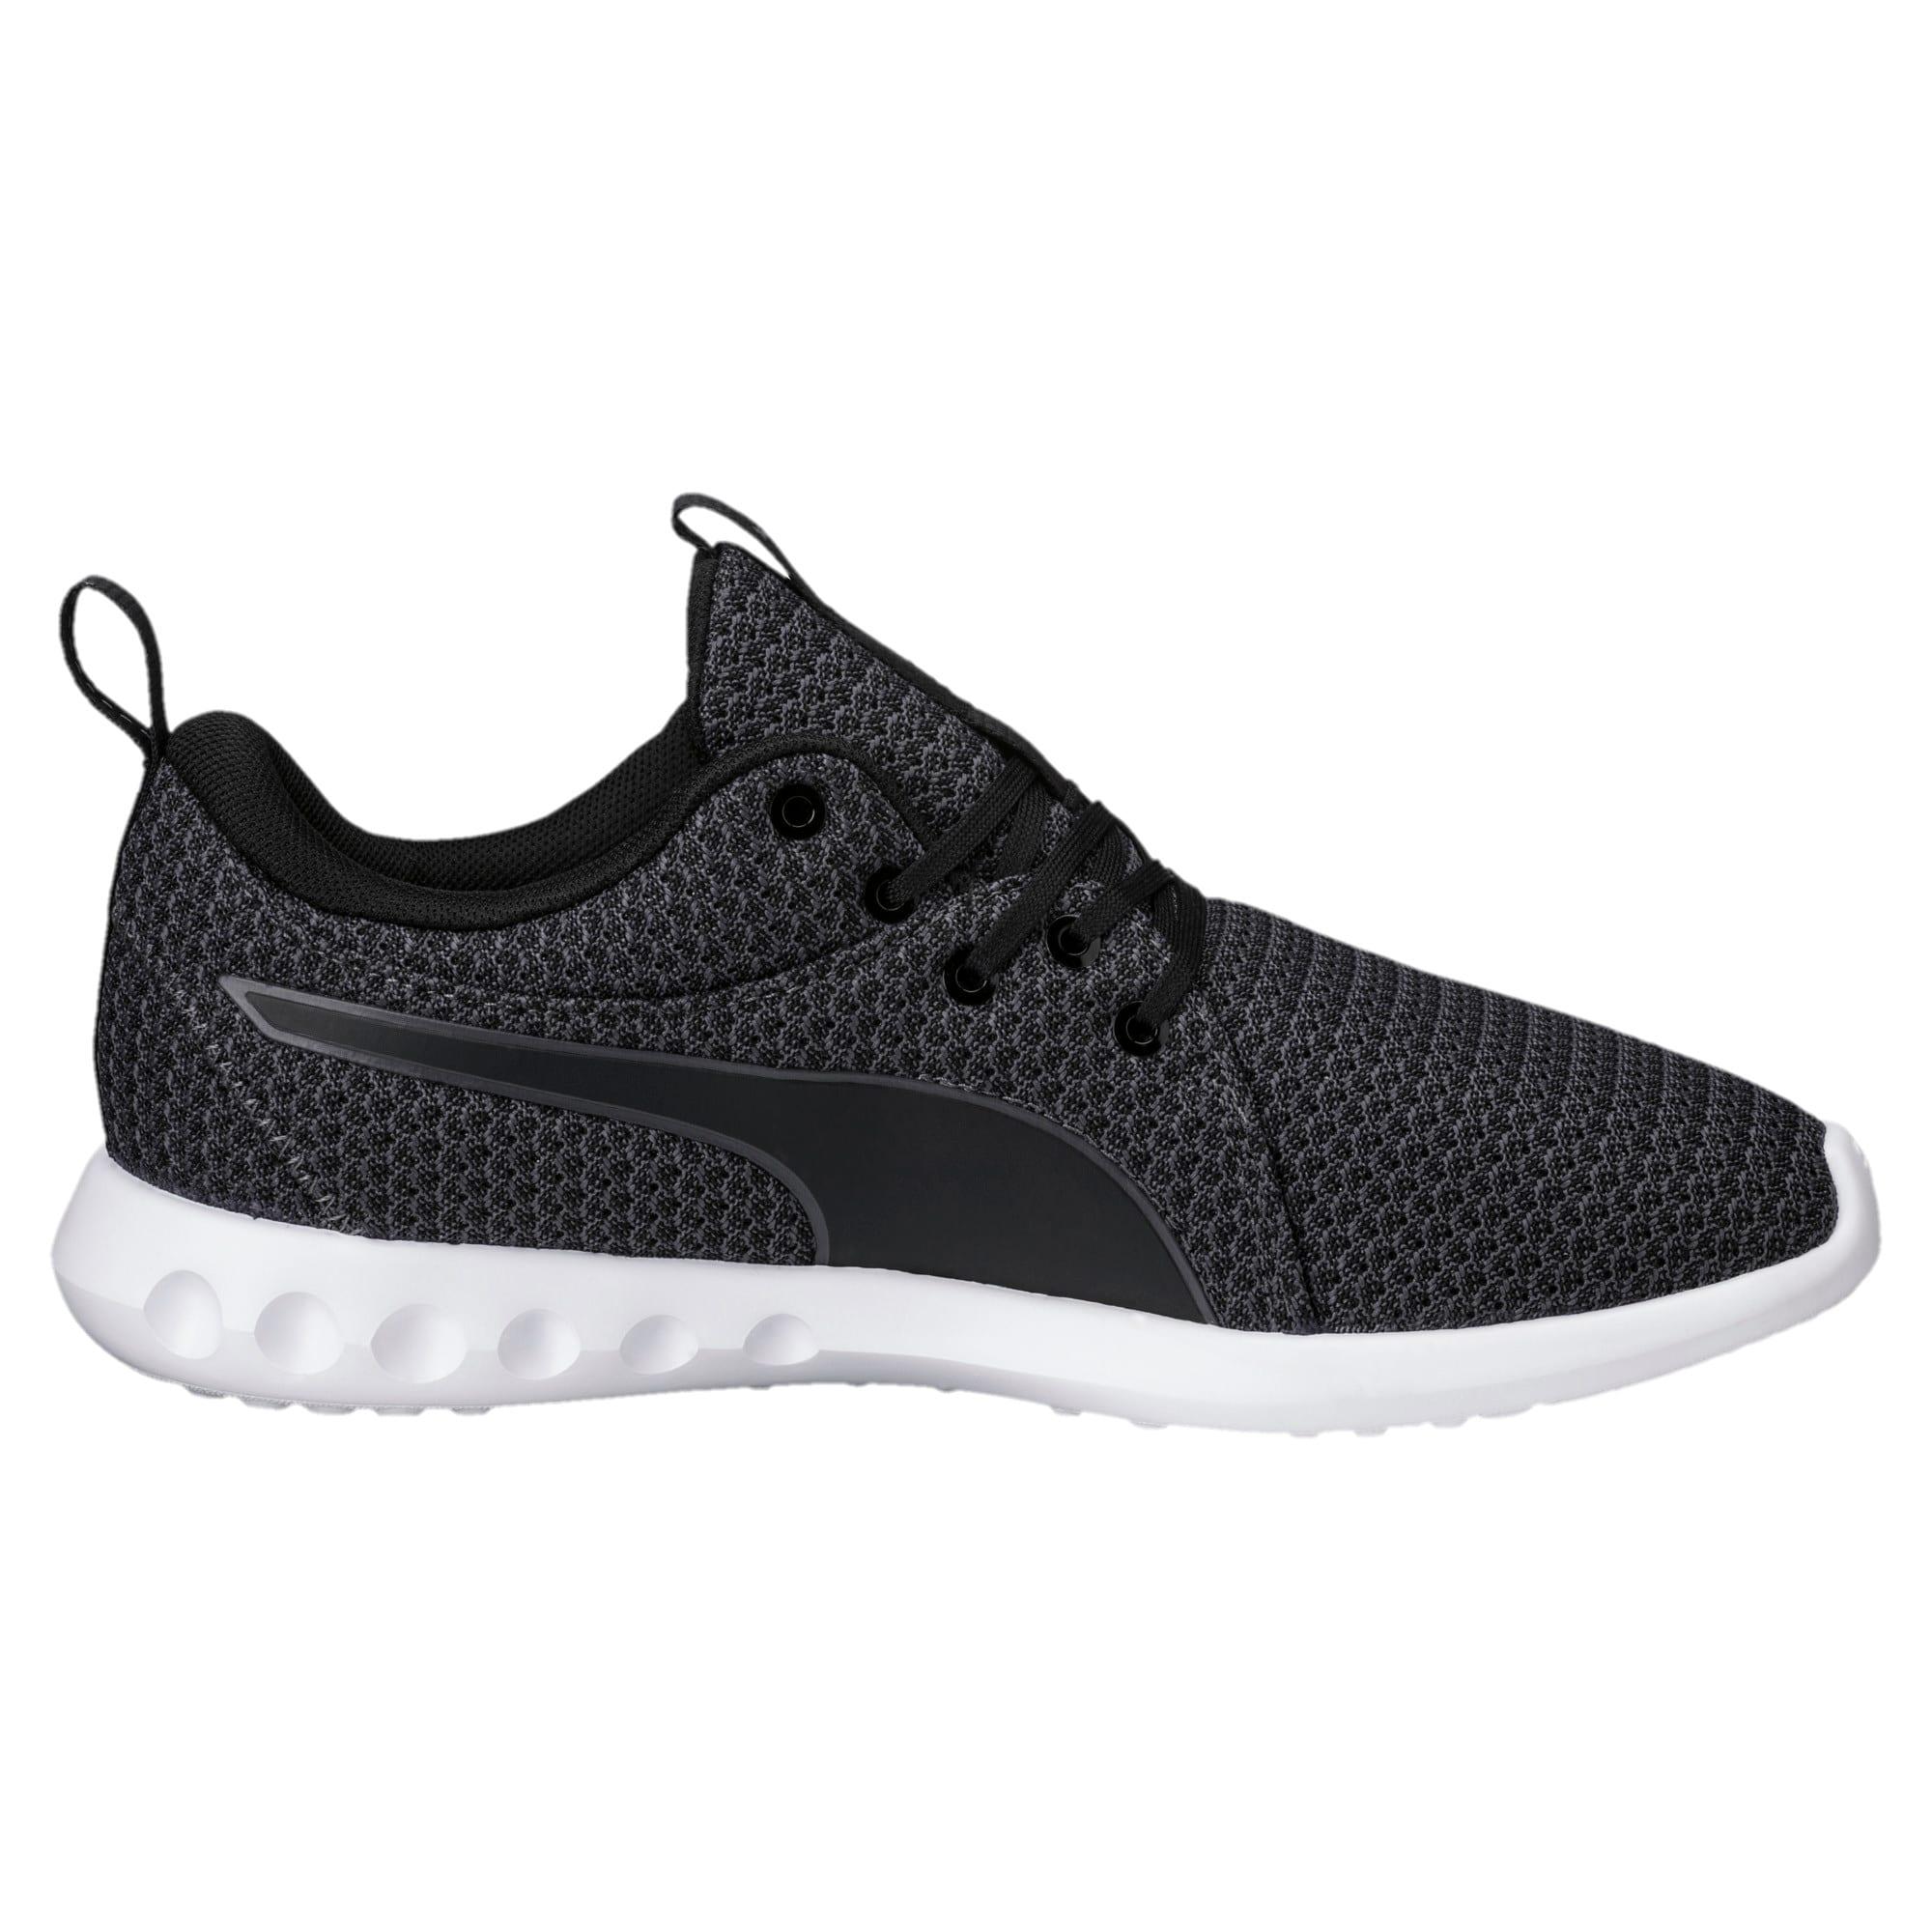 Thumbnail 3 of Carson 2 Knit Women's Running Shoes, Puma Black-Periscope, medium